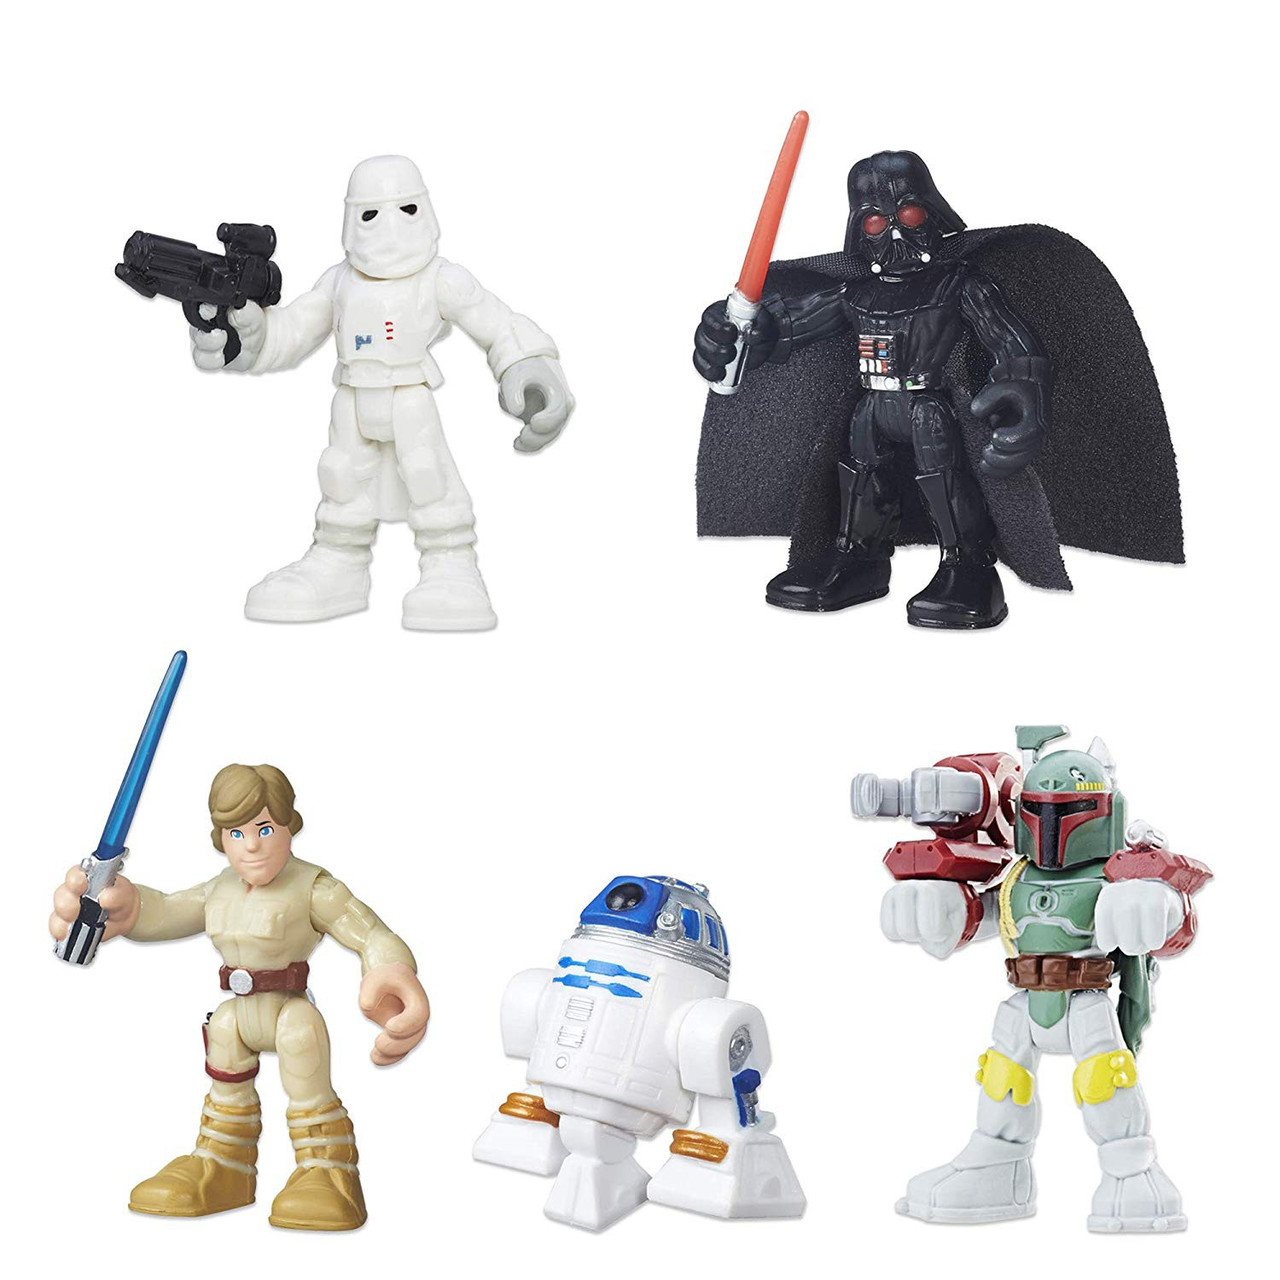 Darts Vader R2D2 Star Wars Jedi Force 3 action mini figures Obi-Wan